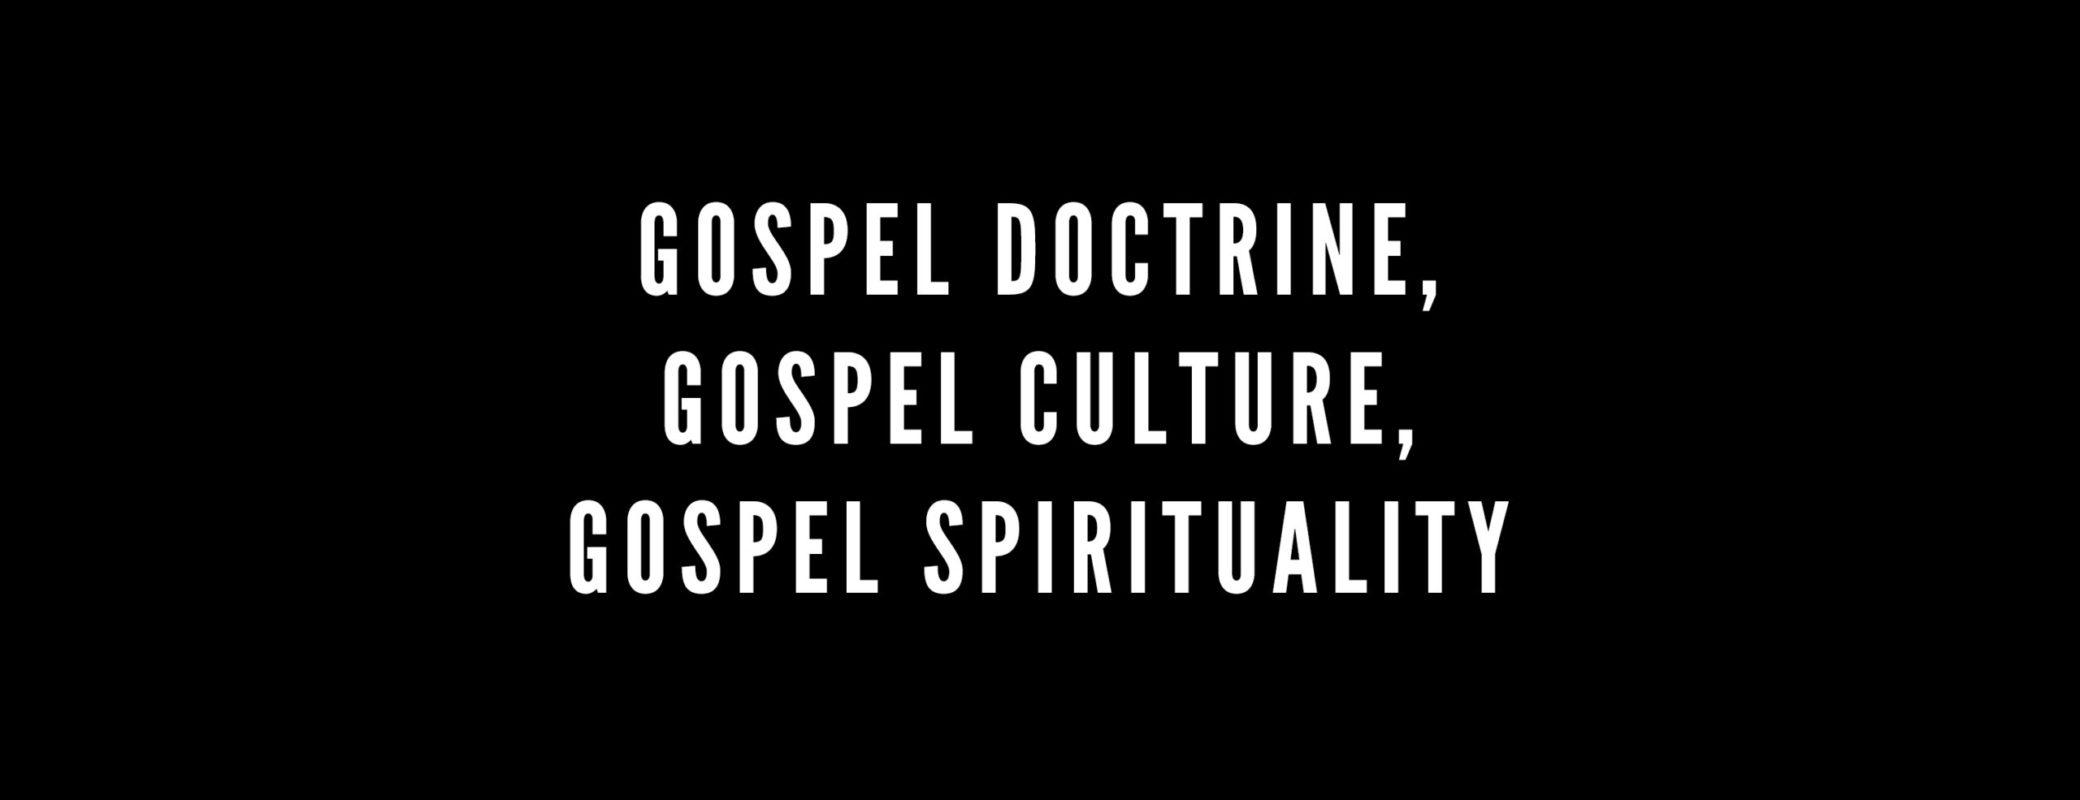 GOSPEL DOCTRINE, GOSPEL CULTURE, GOSPEL SPIRITUALITY